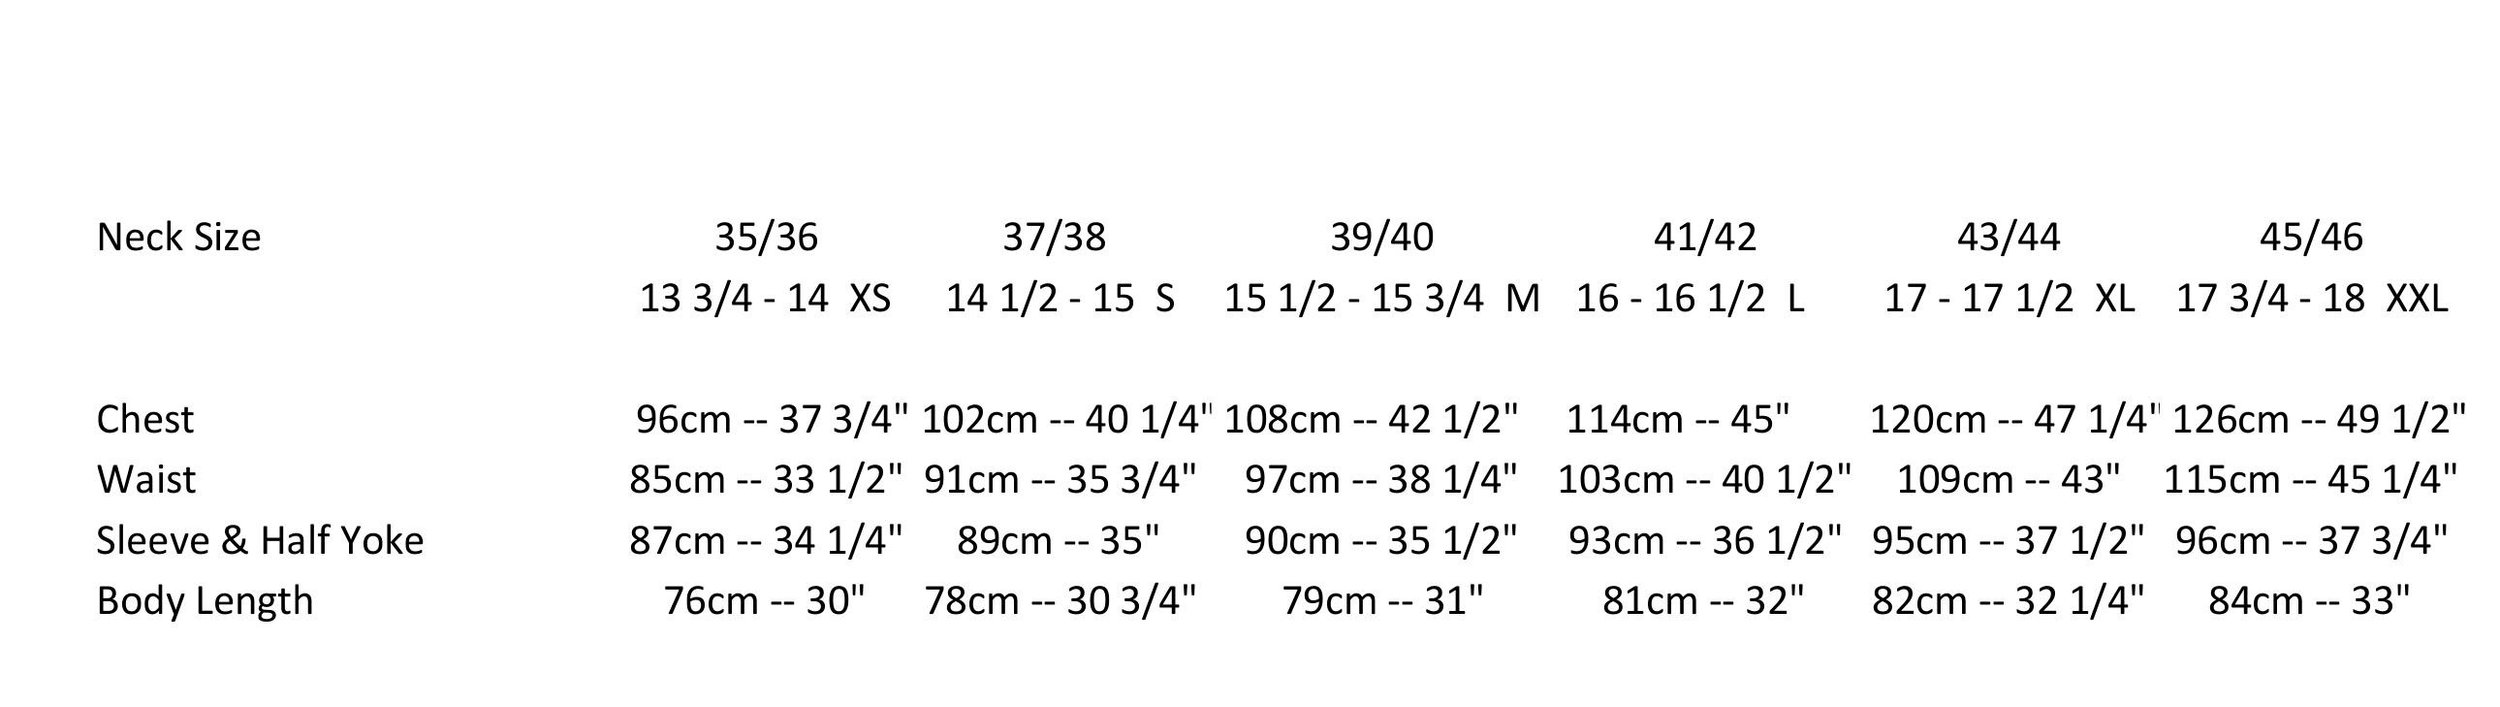 Eton Slim Fit Size Chart.jpg